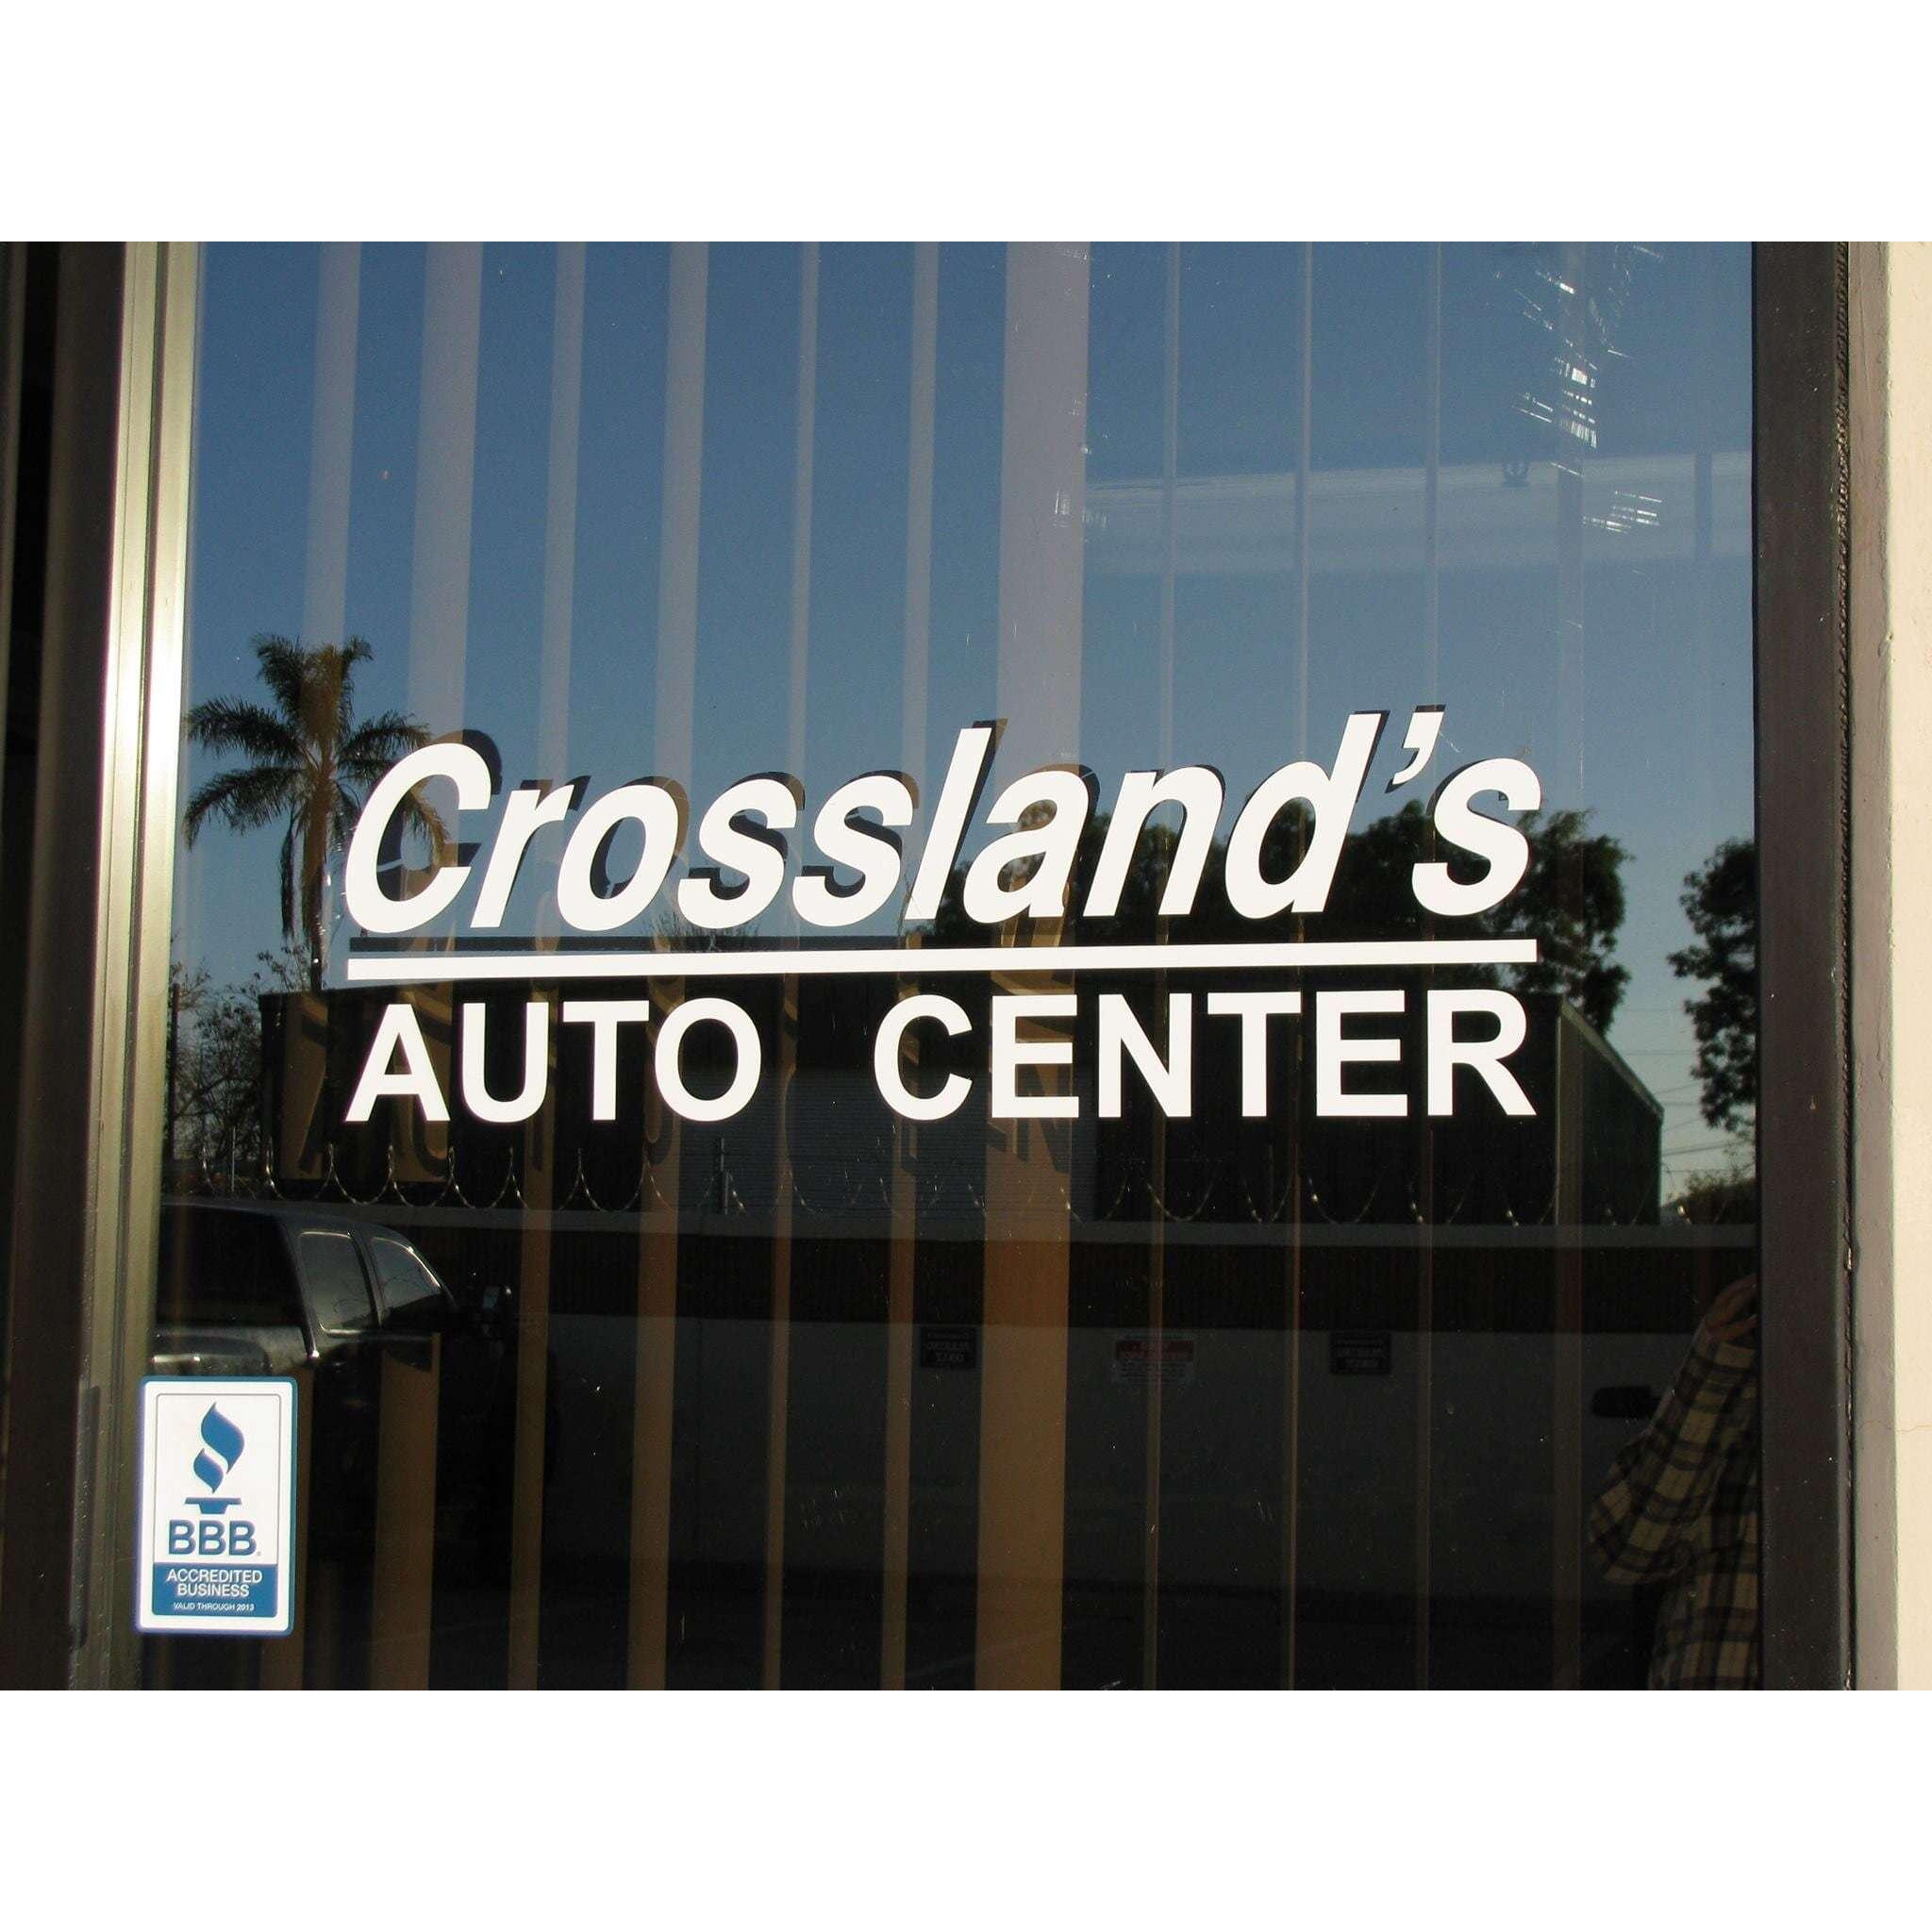 Crossland's Auto Center - El Cajon, CA - General Auto Repair & Service